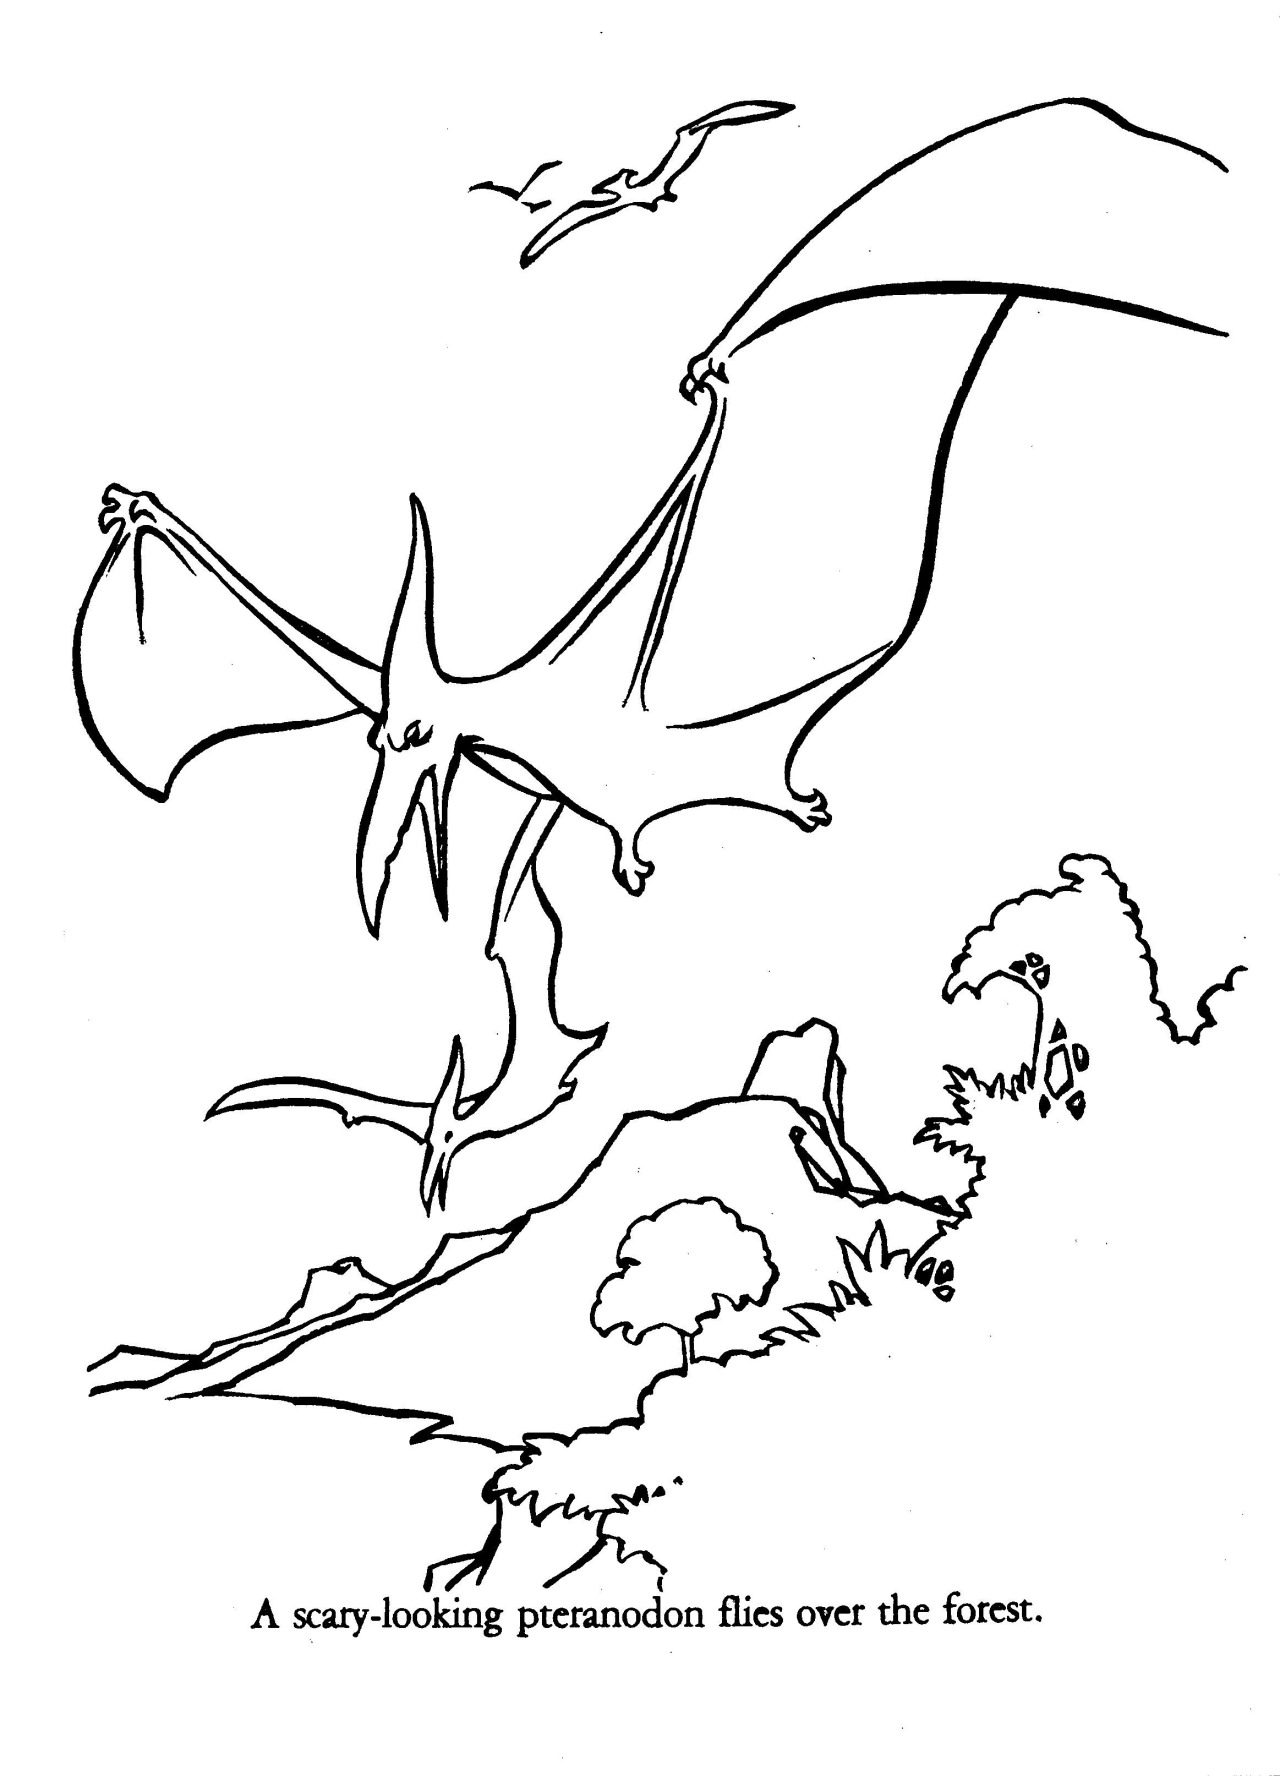 irritator dinosaur coloring pages | Universe of Energy Pteranodon coloring sheet - Dinosaurs ...